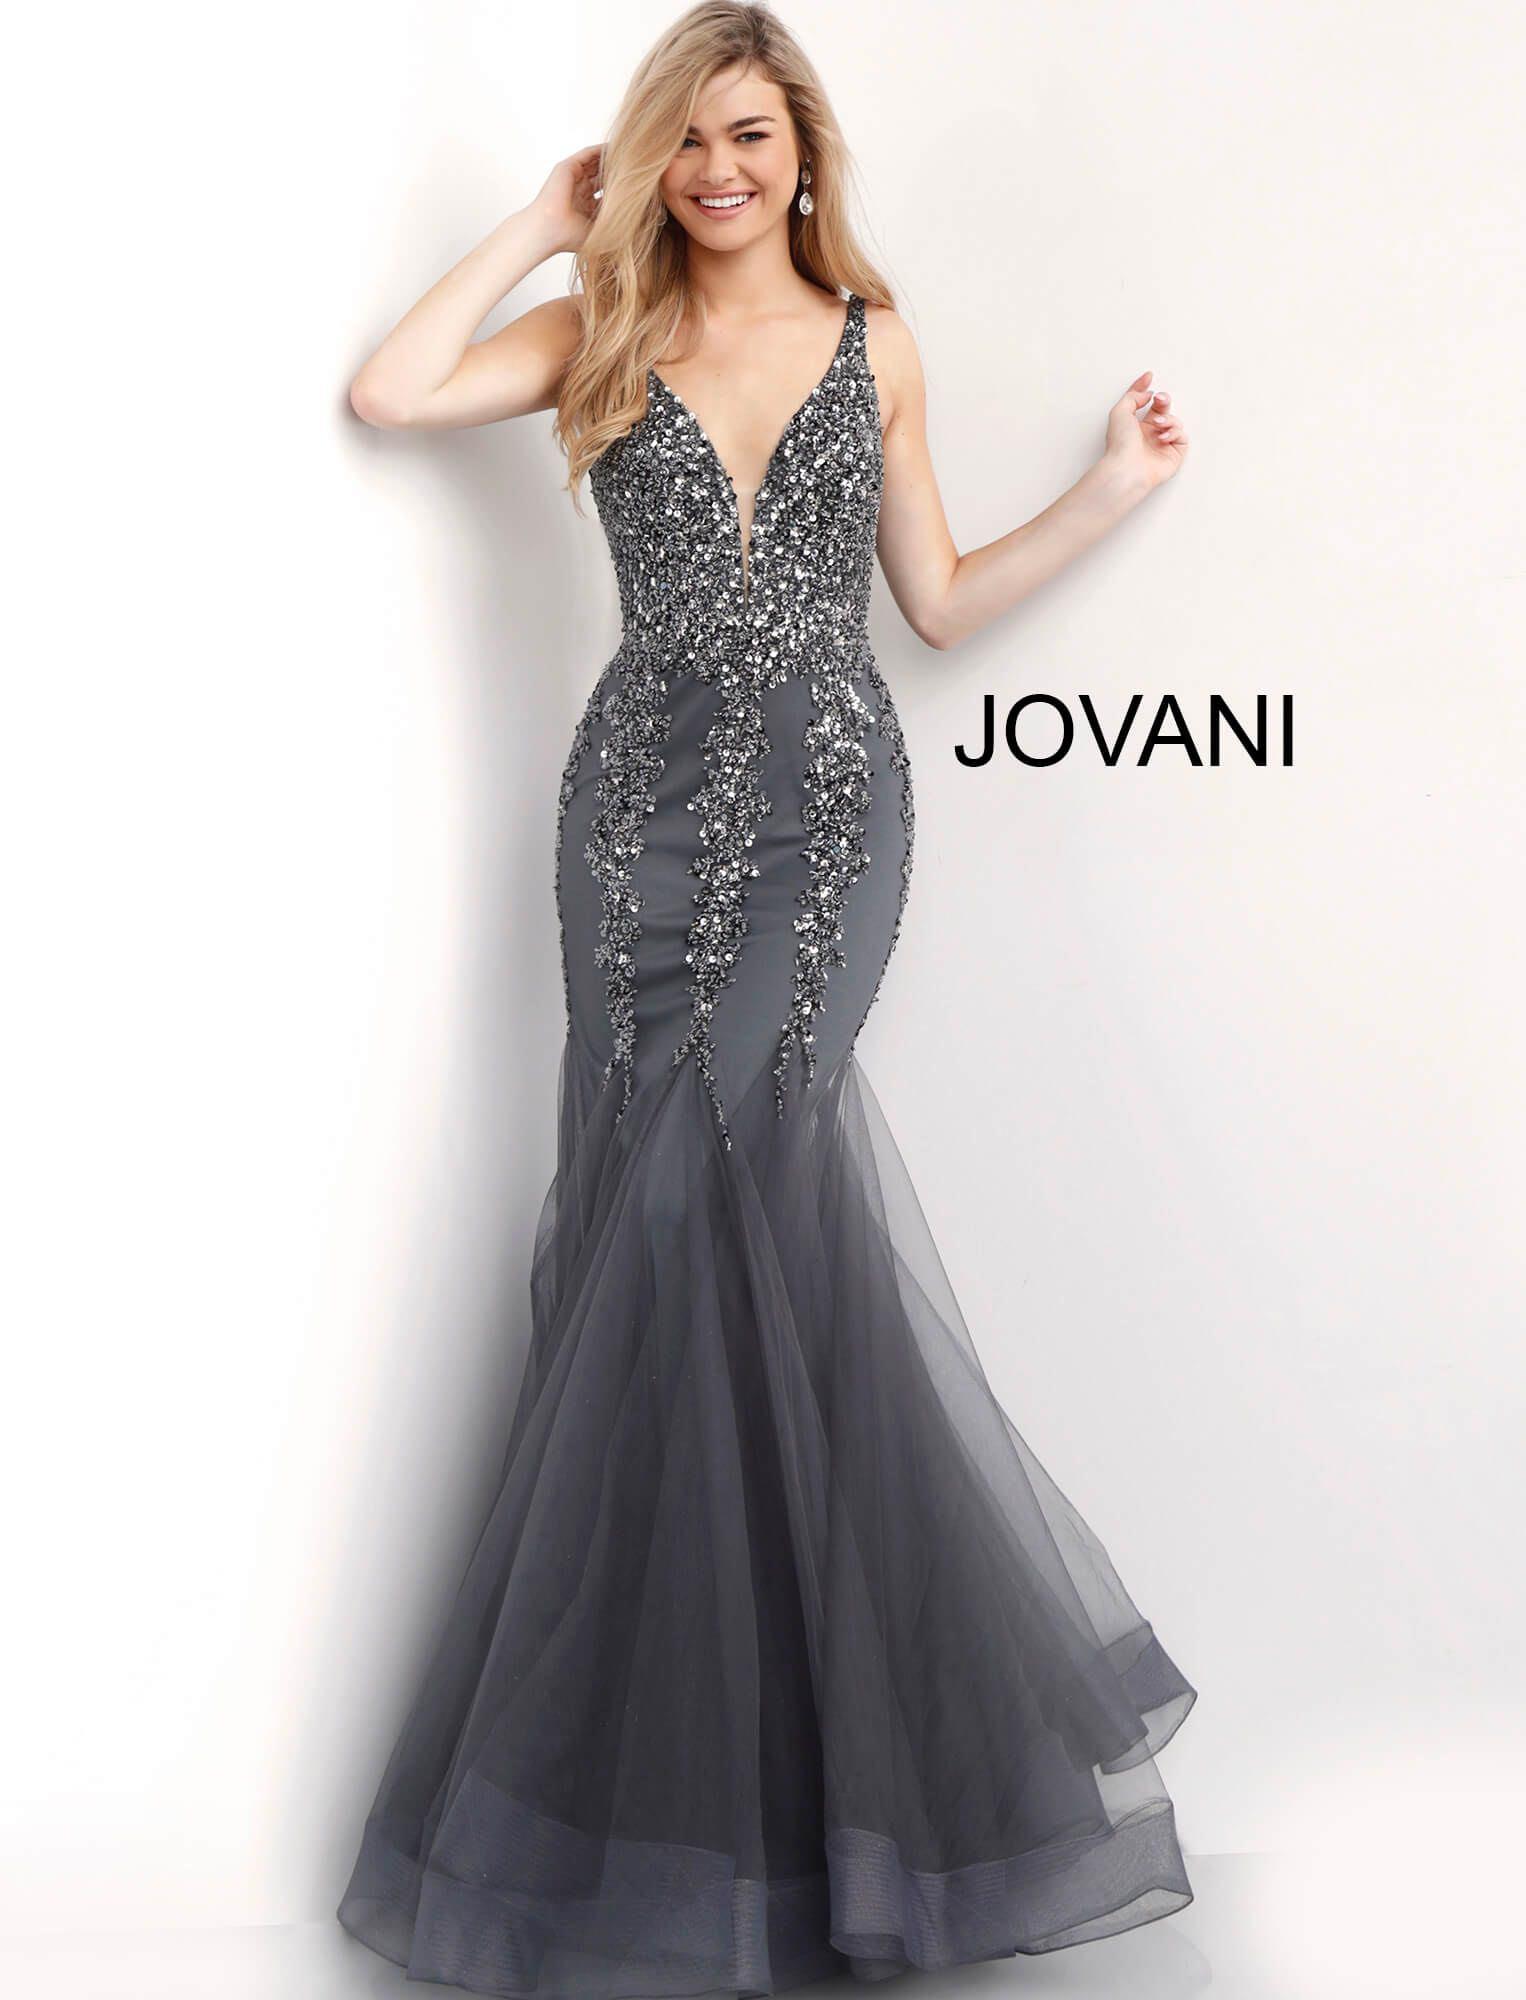 b12c3c79b5b Jovani 63700 - V-Neckline Sexy Form Fitted Sparkling Mermaid Dress